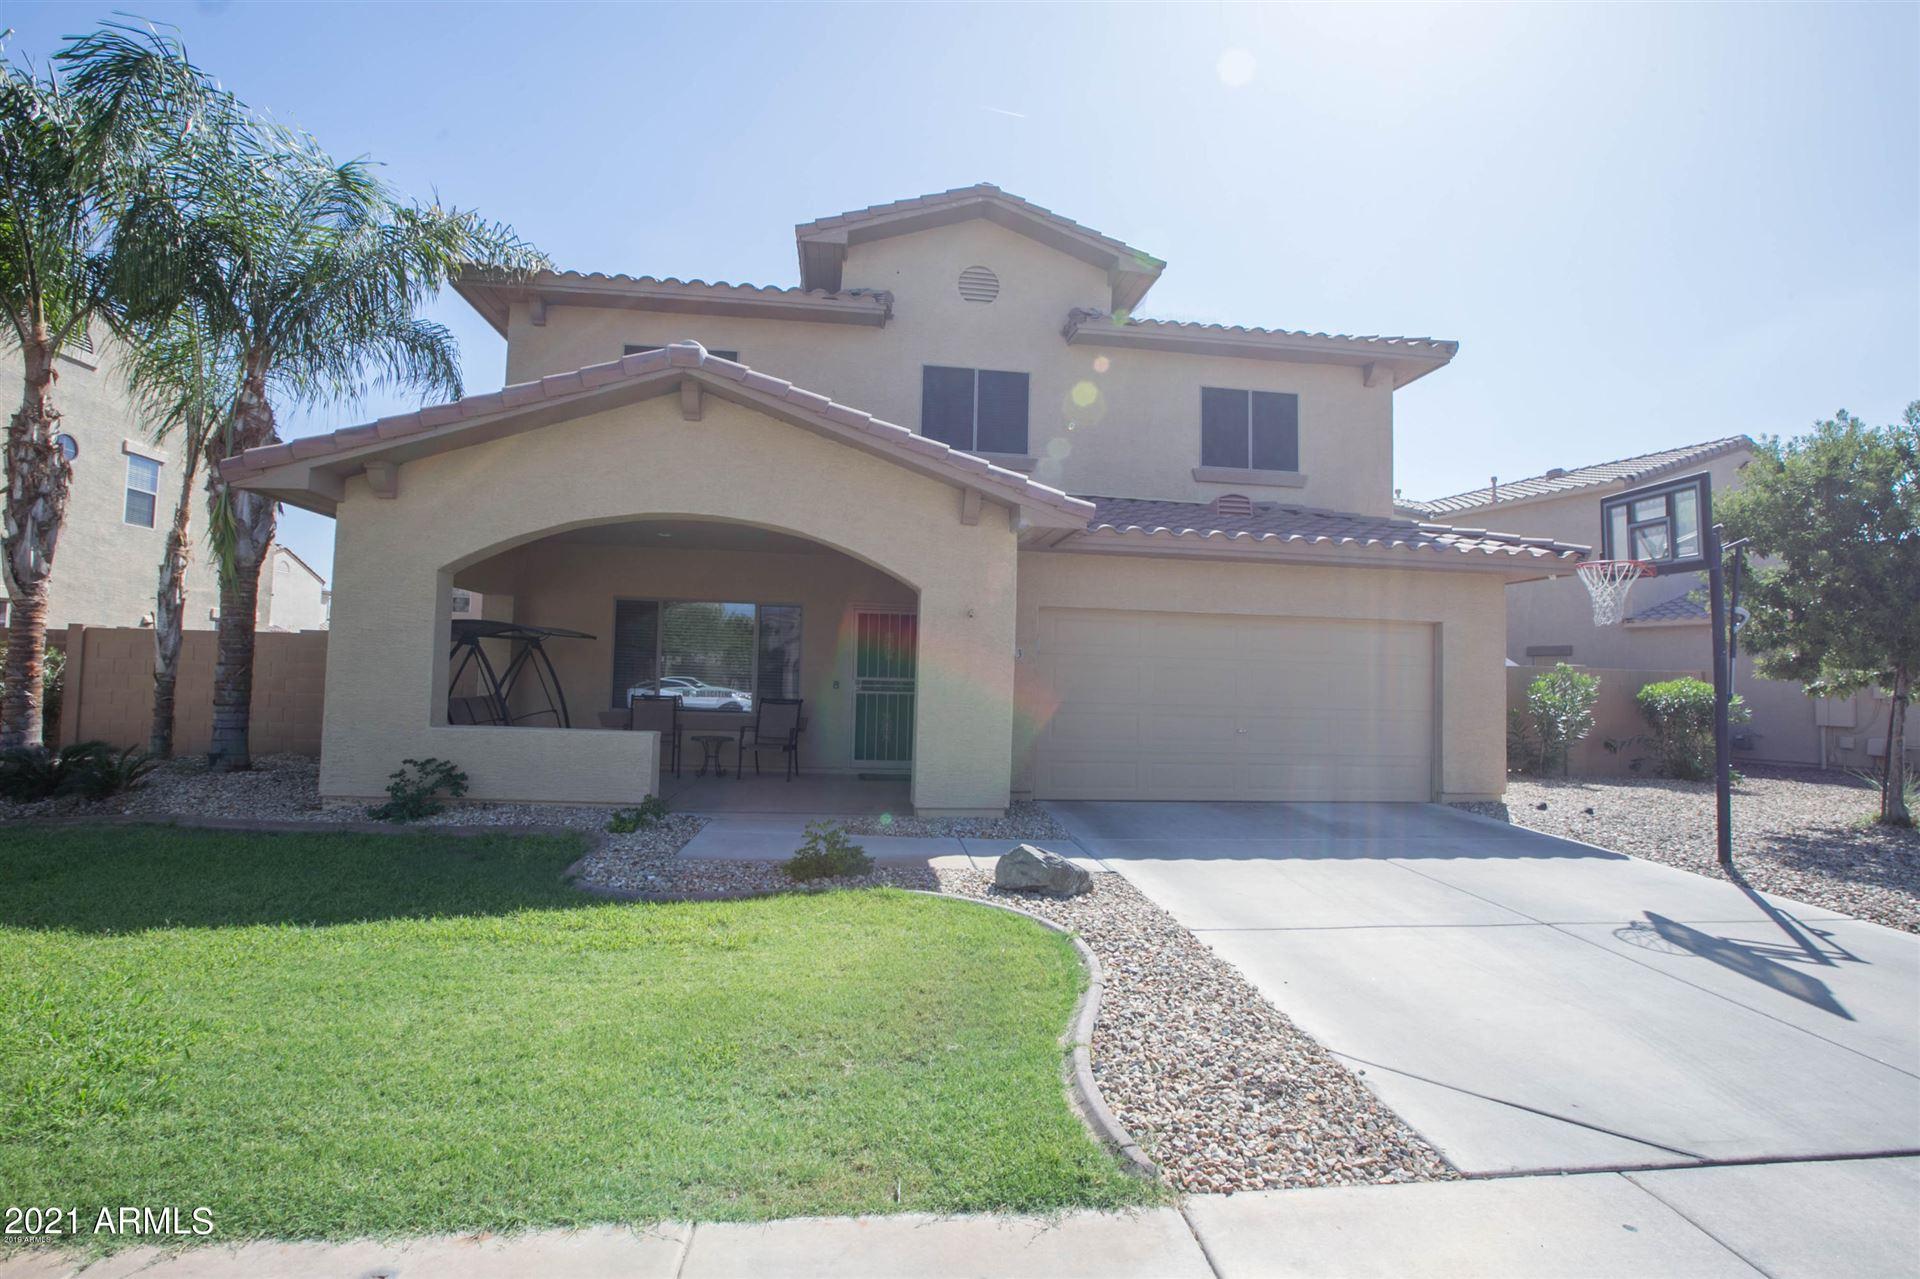 Photo of 13313 W INDIANOLA Avenue, Litchfield Park, AZ 85340 (MLS # 6304758)